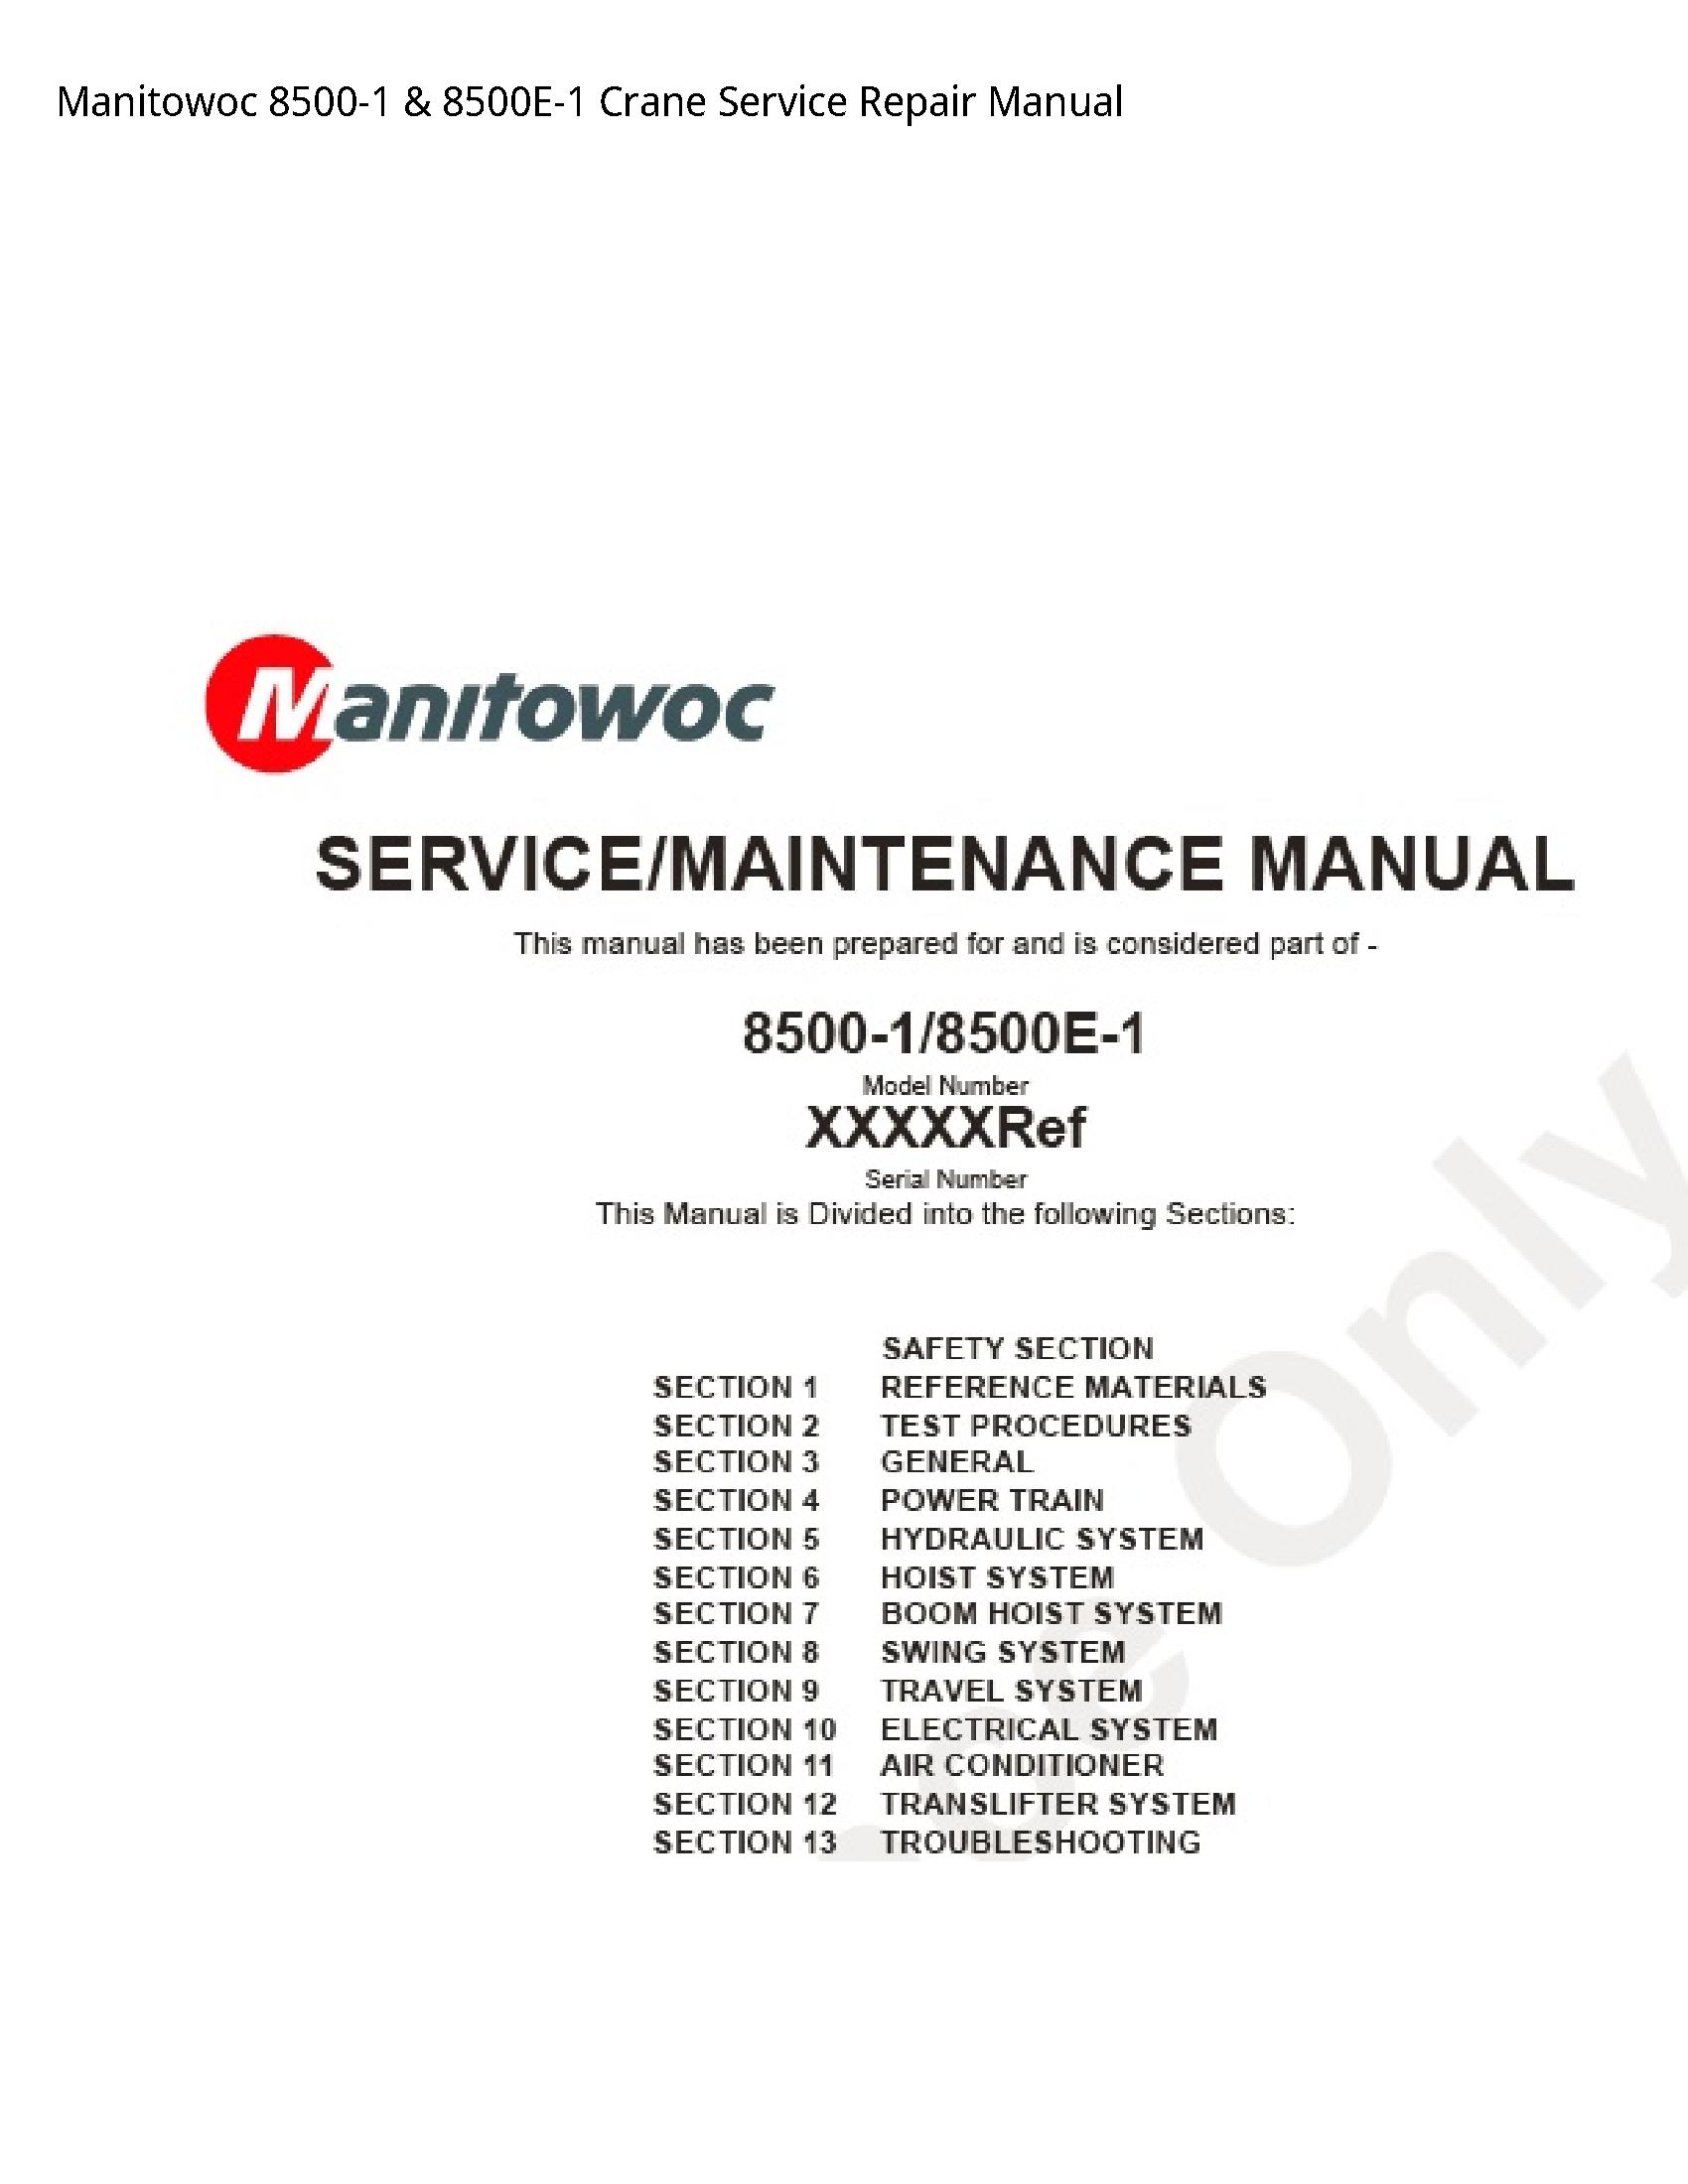 Manitowoc 8500-1 Crane manual